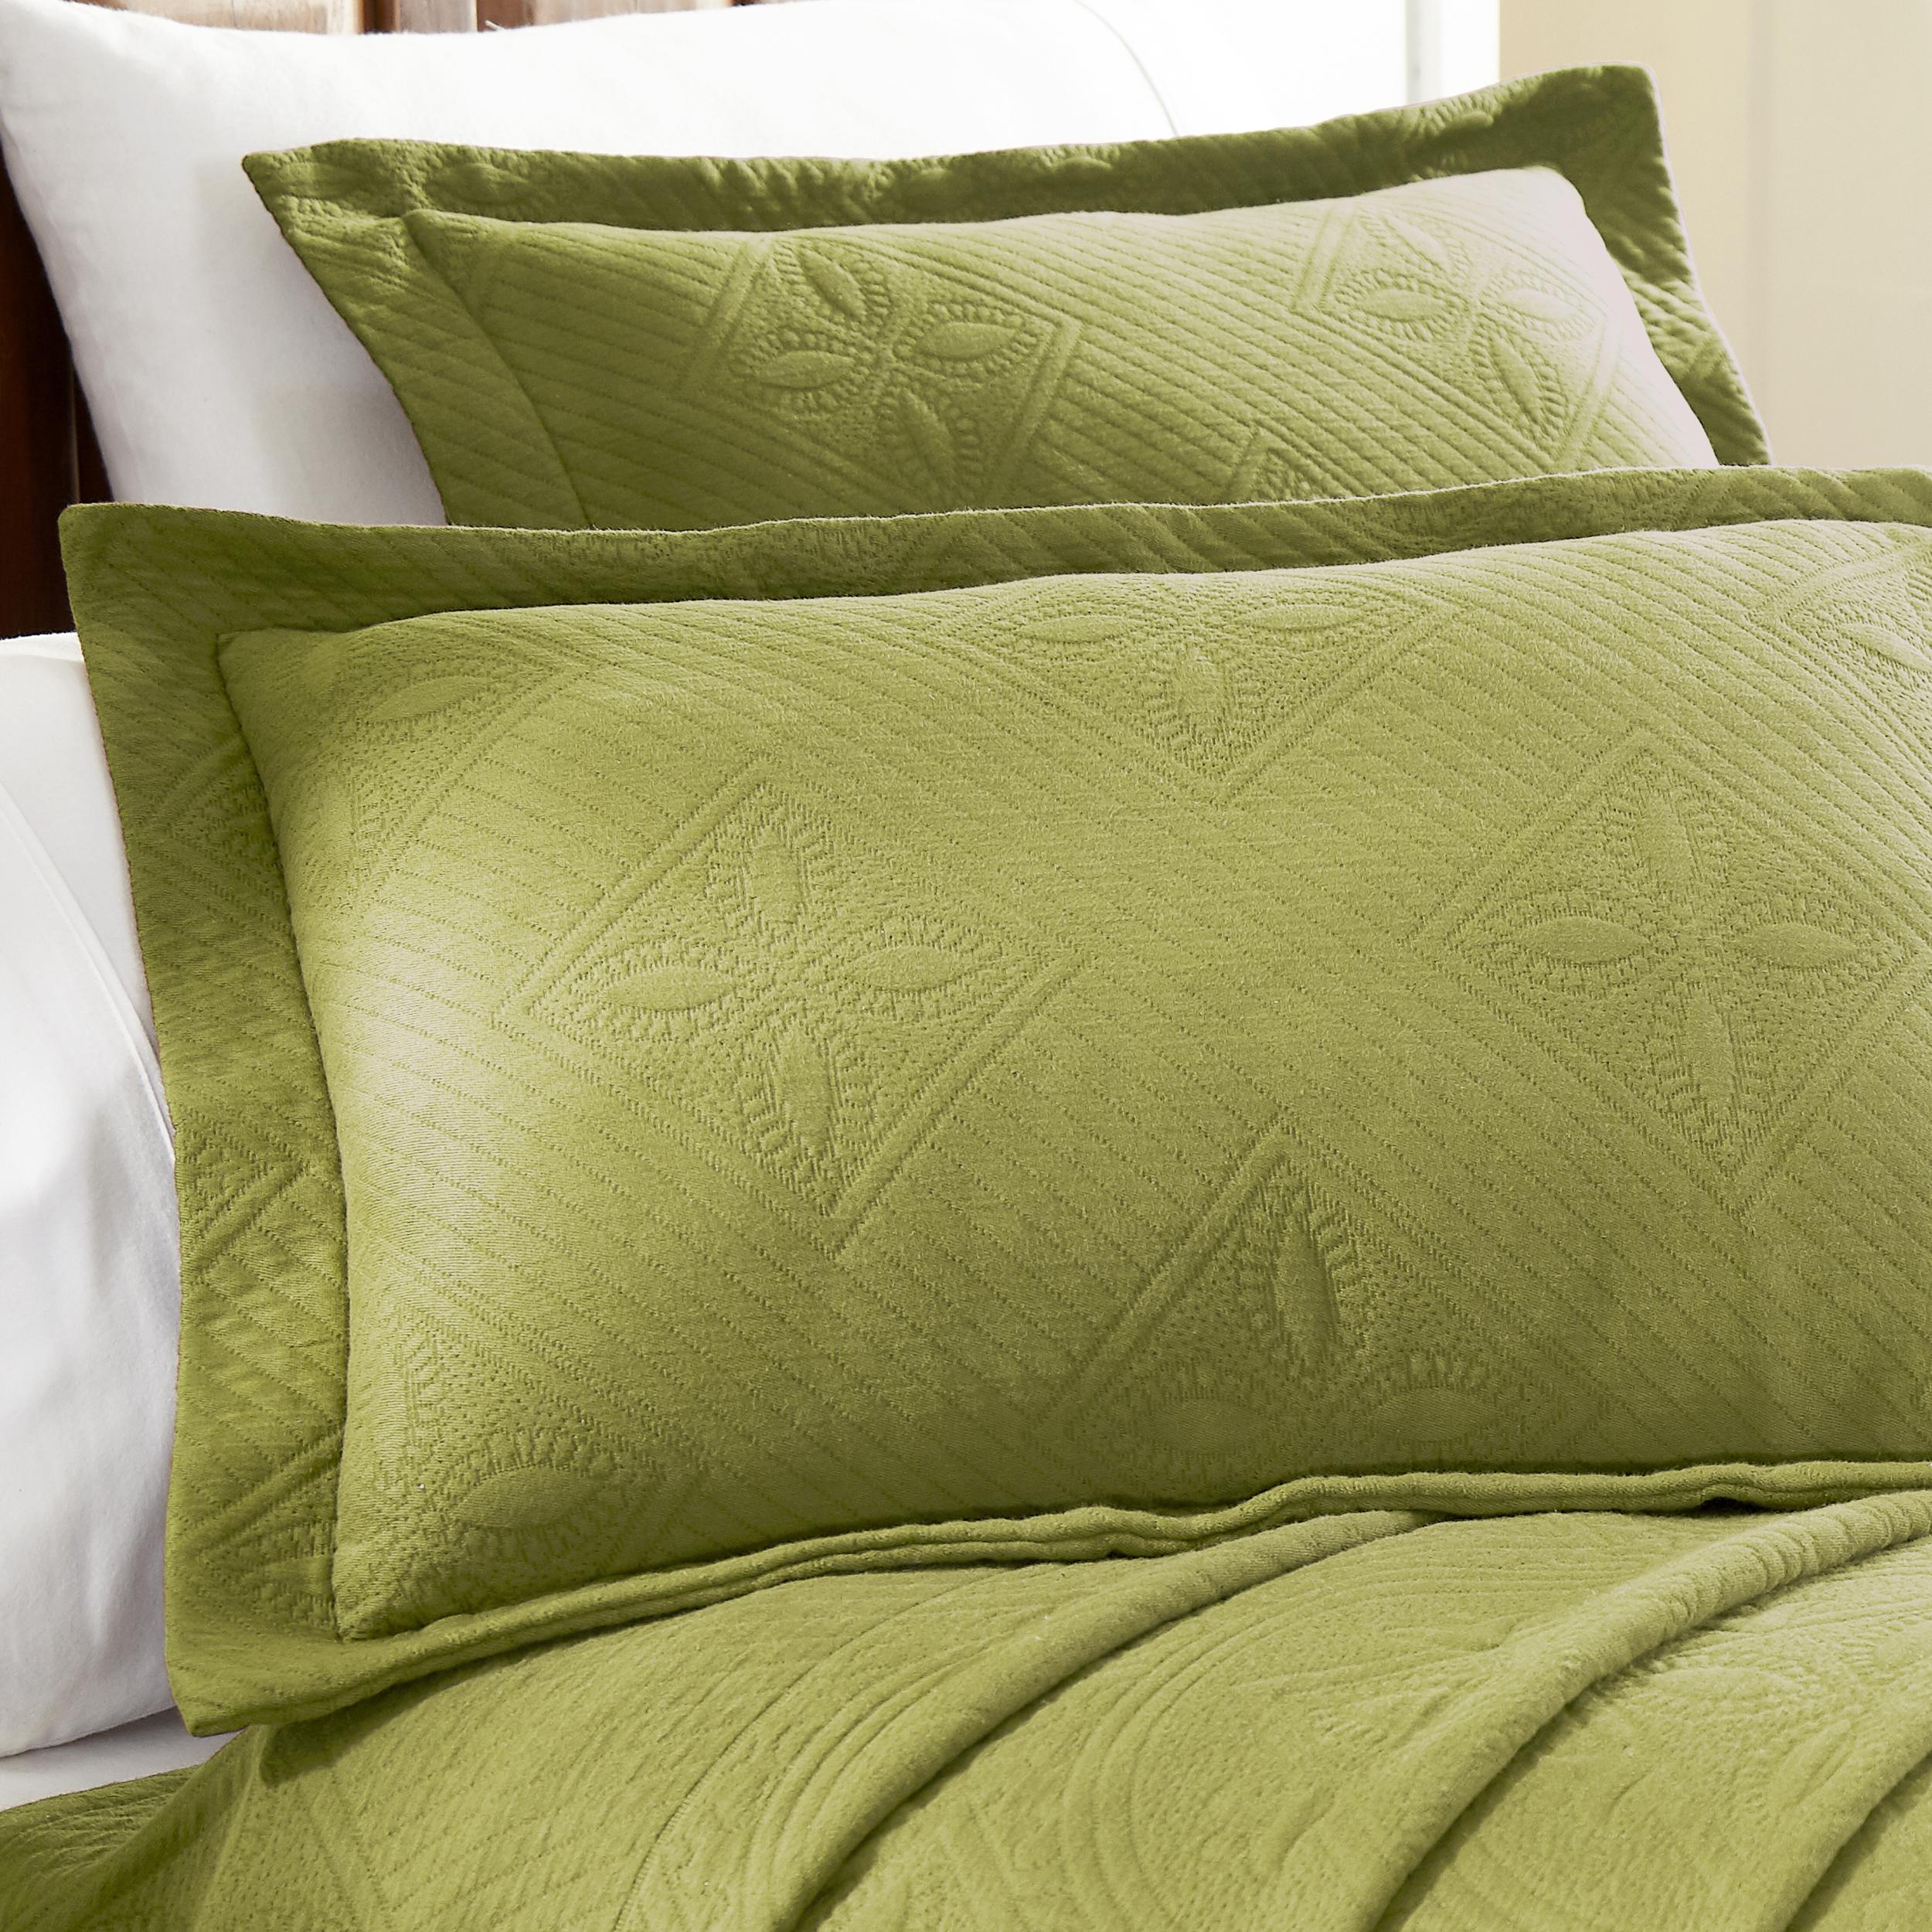 Celtic-Circle-Cotton-Jacquard-Matelasse-Scalloped-Bedspread-Set thumbnail 29